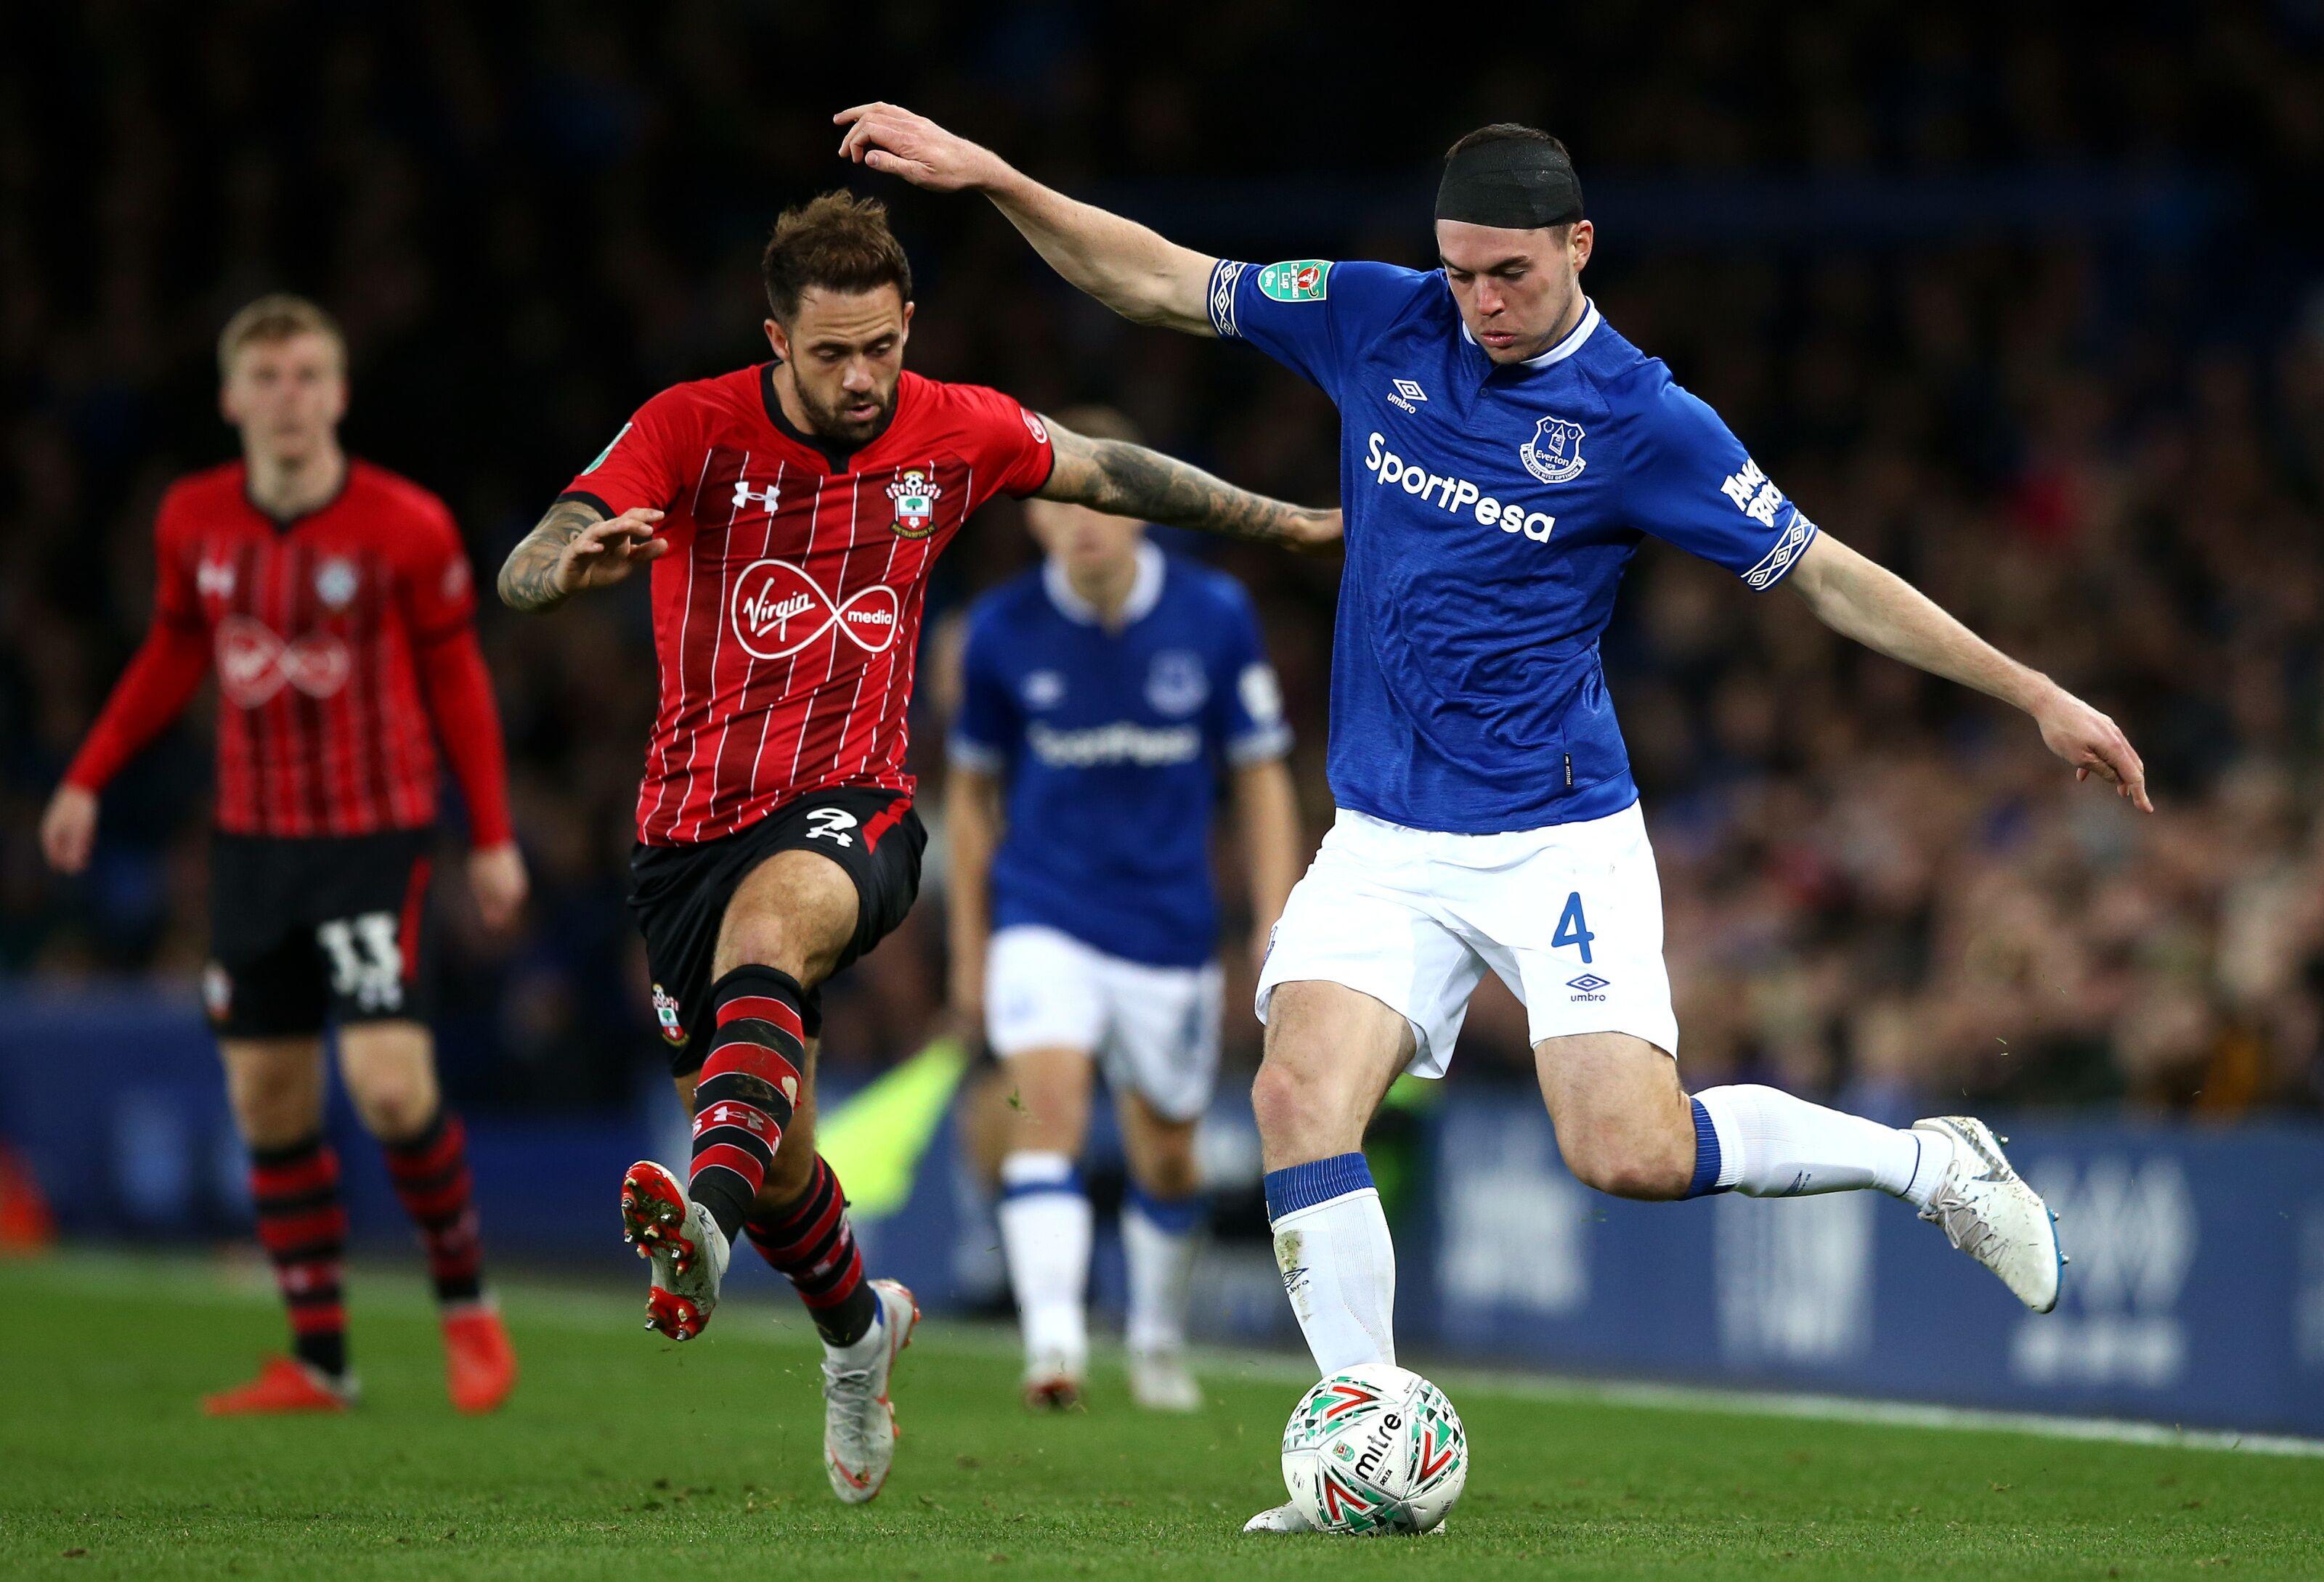 Southampton: Danny Ings must step up this weekend against Chelsea